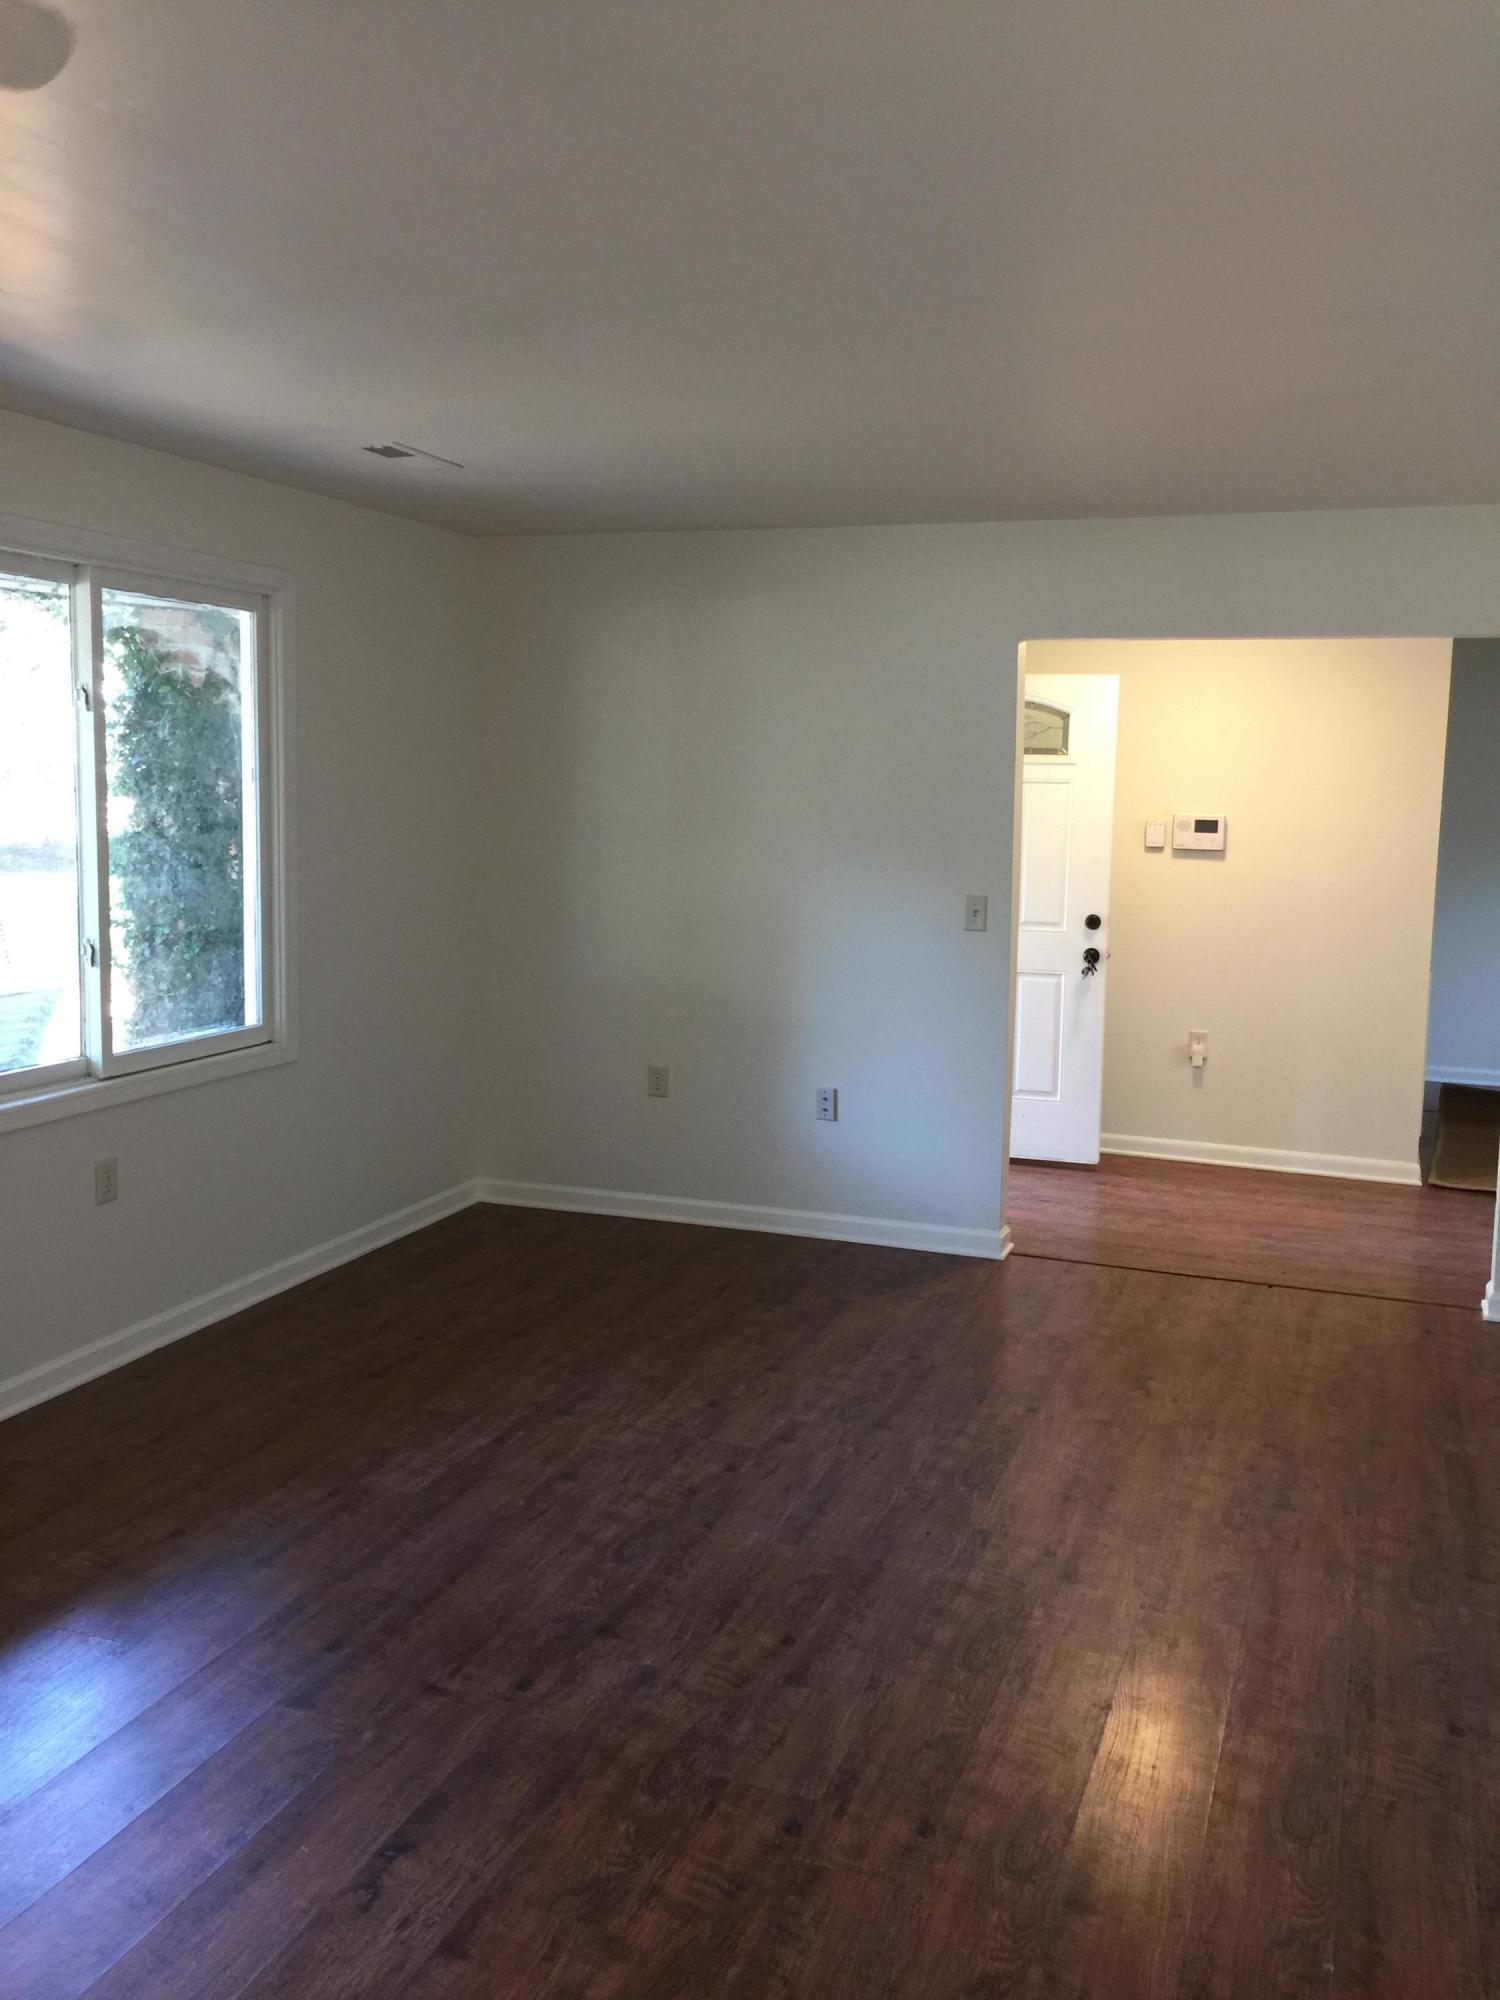 Quail Run Homes For Sale - 1202 Chicorie, Charleston, SC - 6